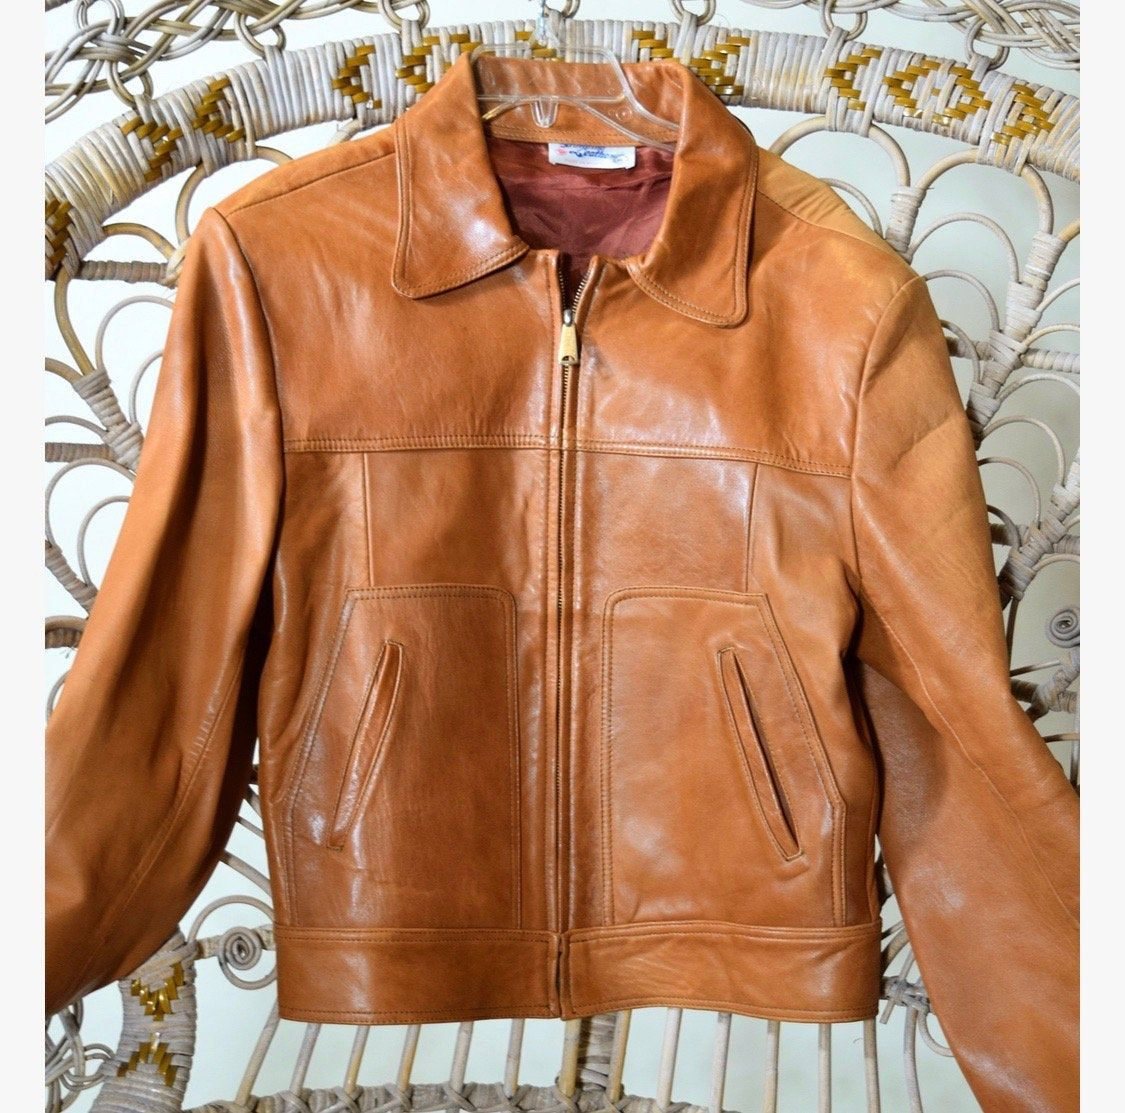 Authentic vintage jacket genuine leather